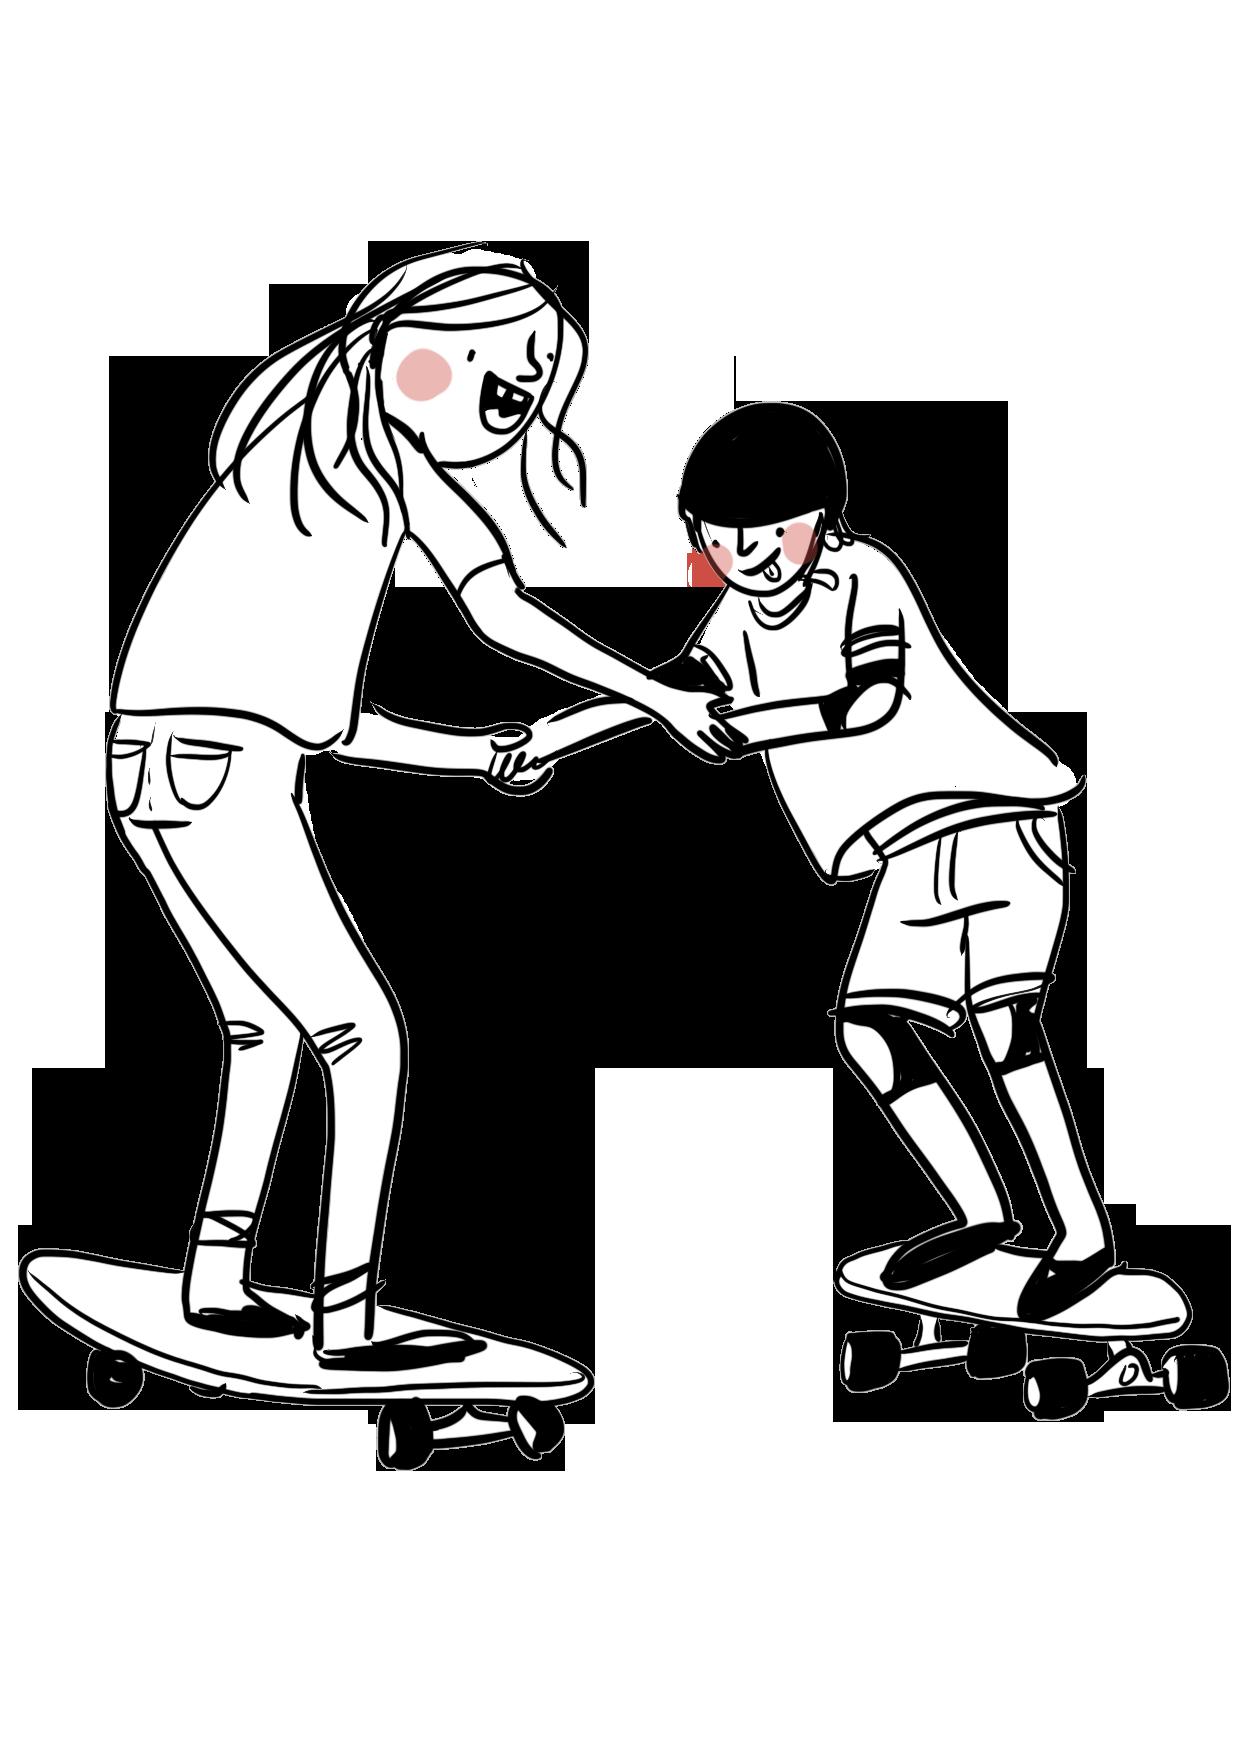 skatergirls_1_web.png